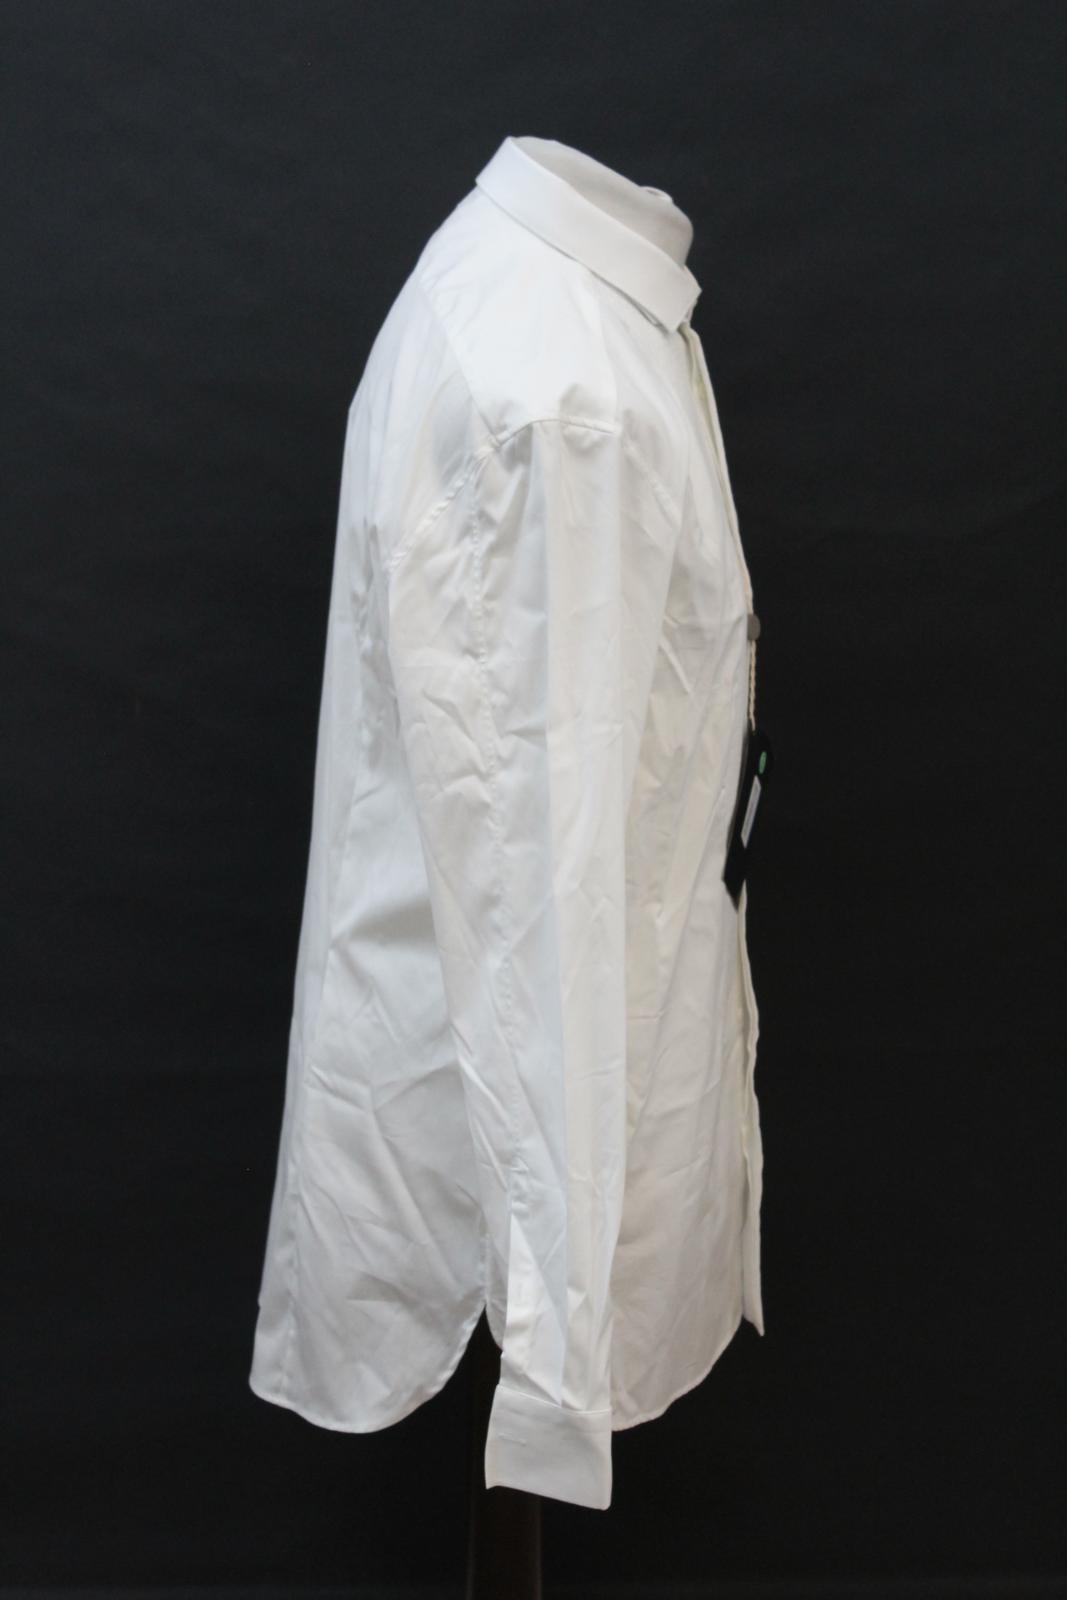 Neil-Barrett-Hombre-Blanco-De-Algodon-Manga-Larga-Camiseta-Formal-Cuello-17-034-43cm-BNWT miniatura 4